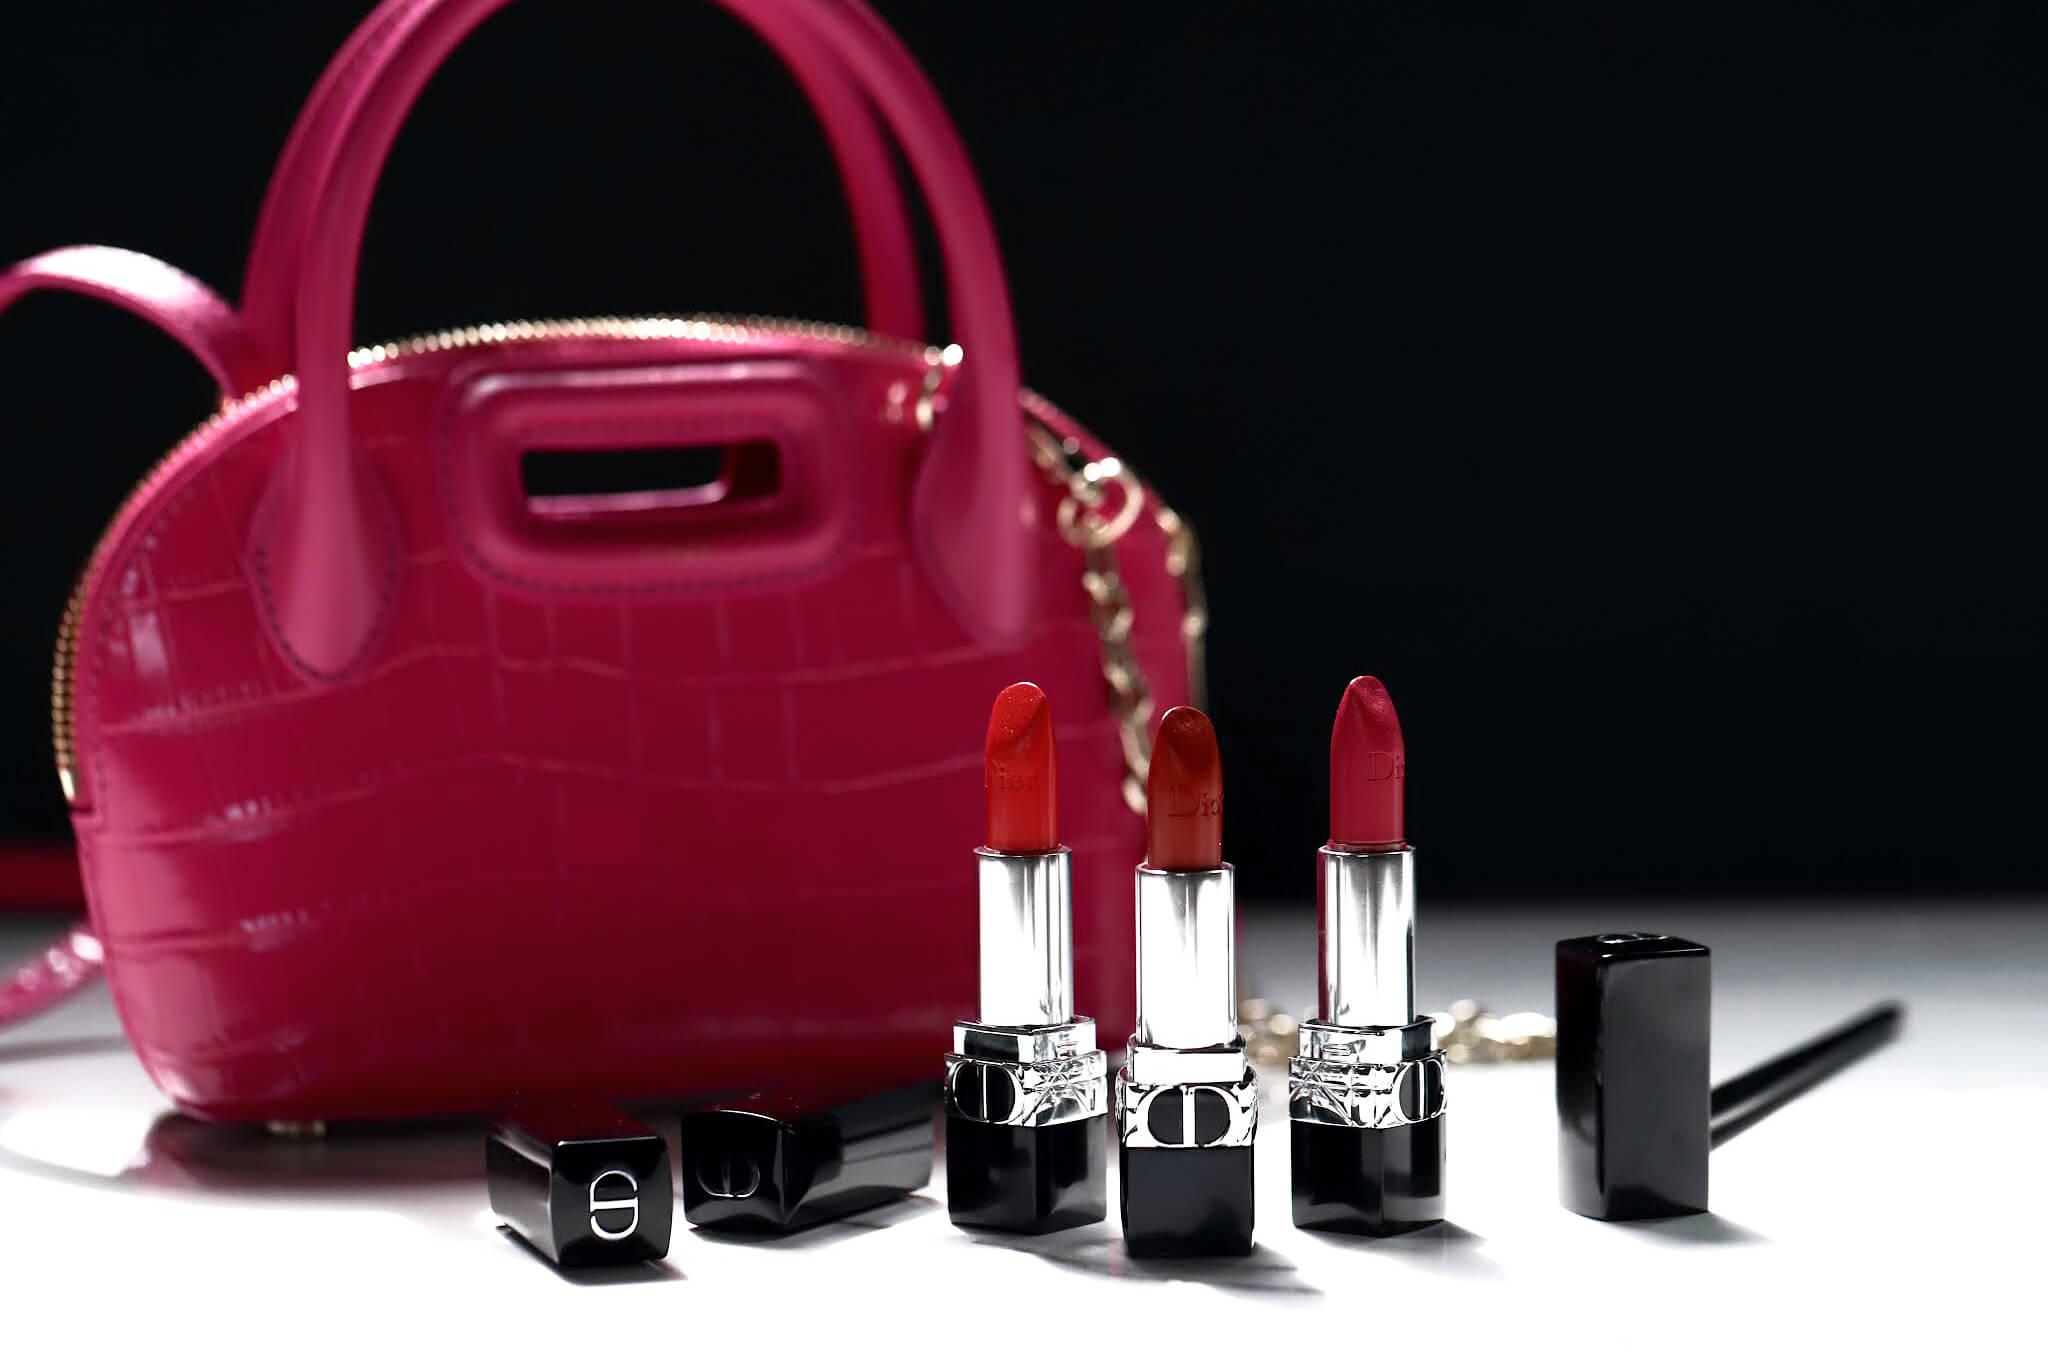 Dior Rouge Satiné 766 rose harpers 849 rouge cinema 844 trafalgar